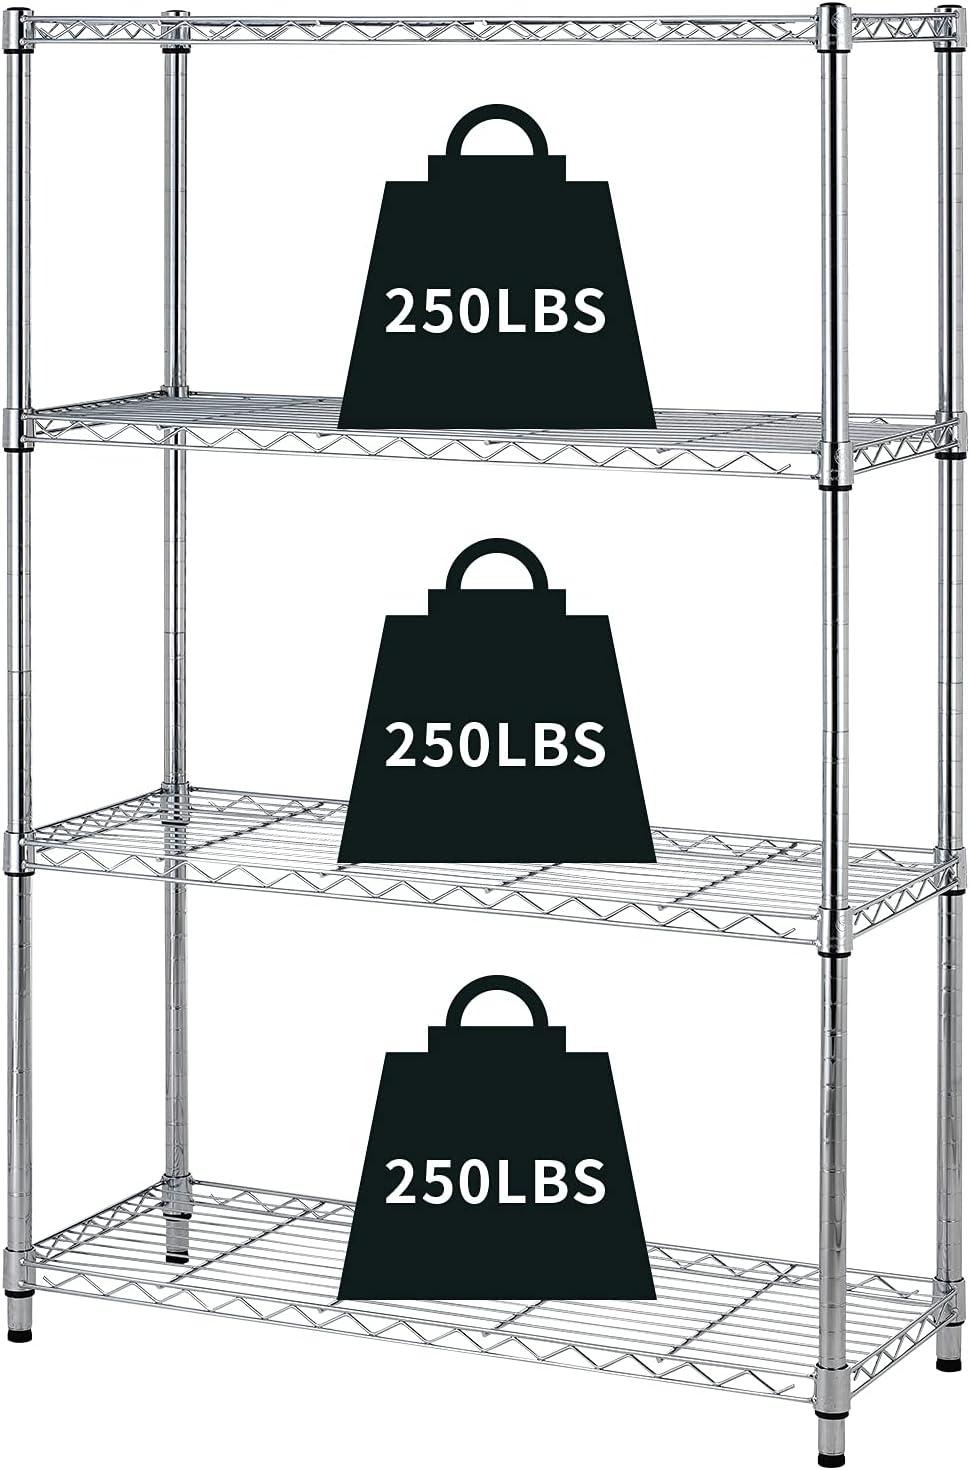 Rapid rise HCY Super special price 4-Tier Storage Shelf Heavy He Shelving Unit Duty NSF